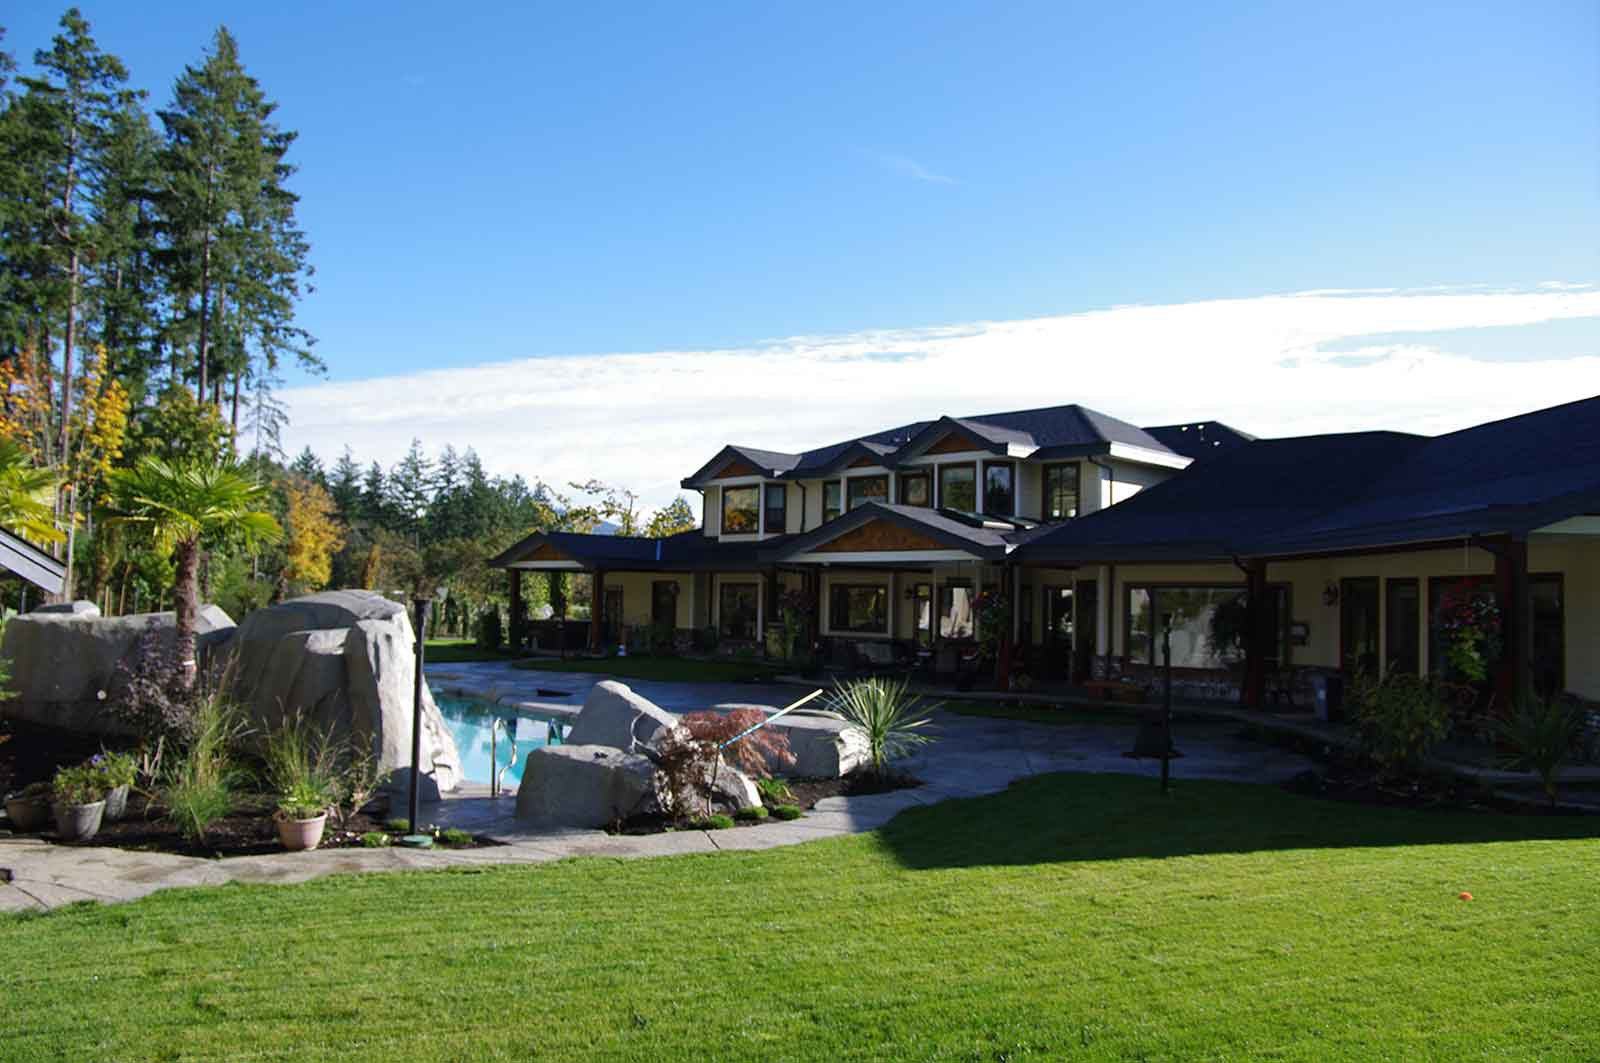 Backyard design with pool and patio